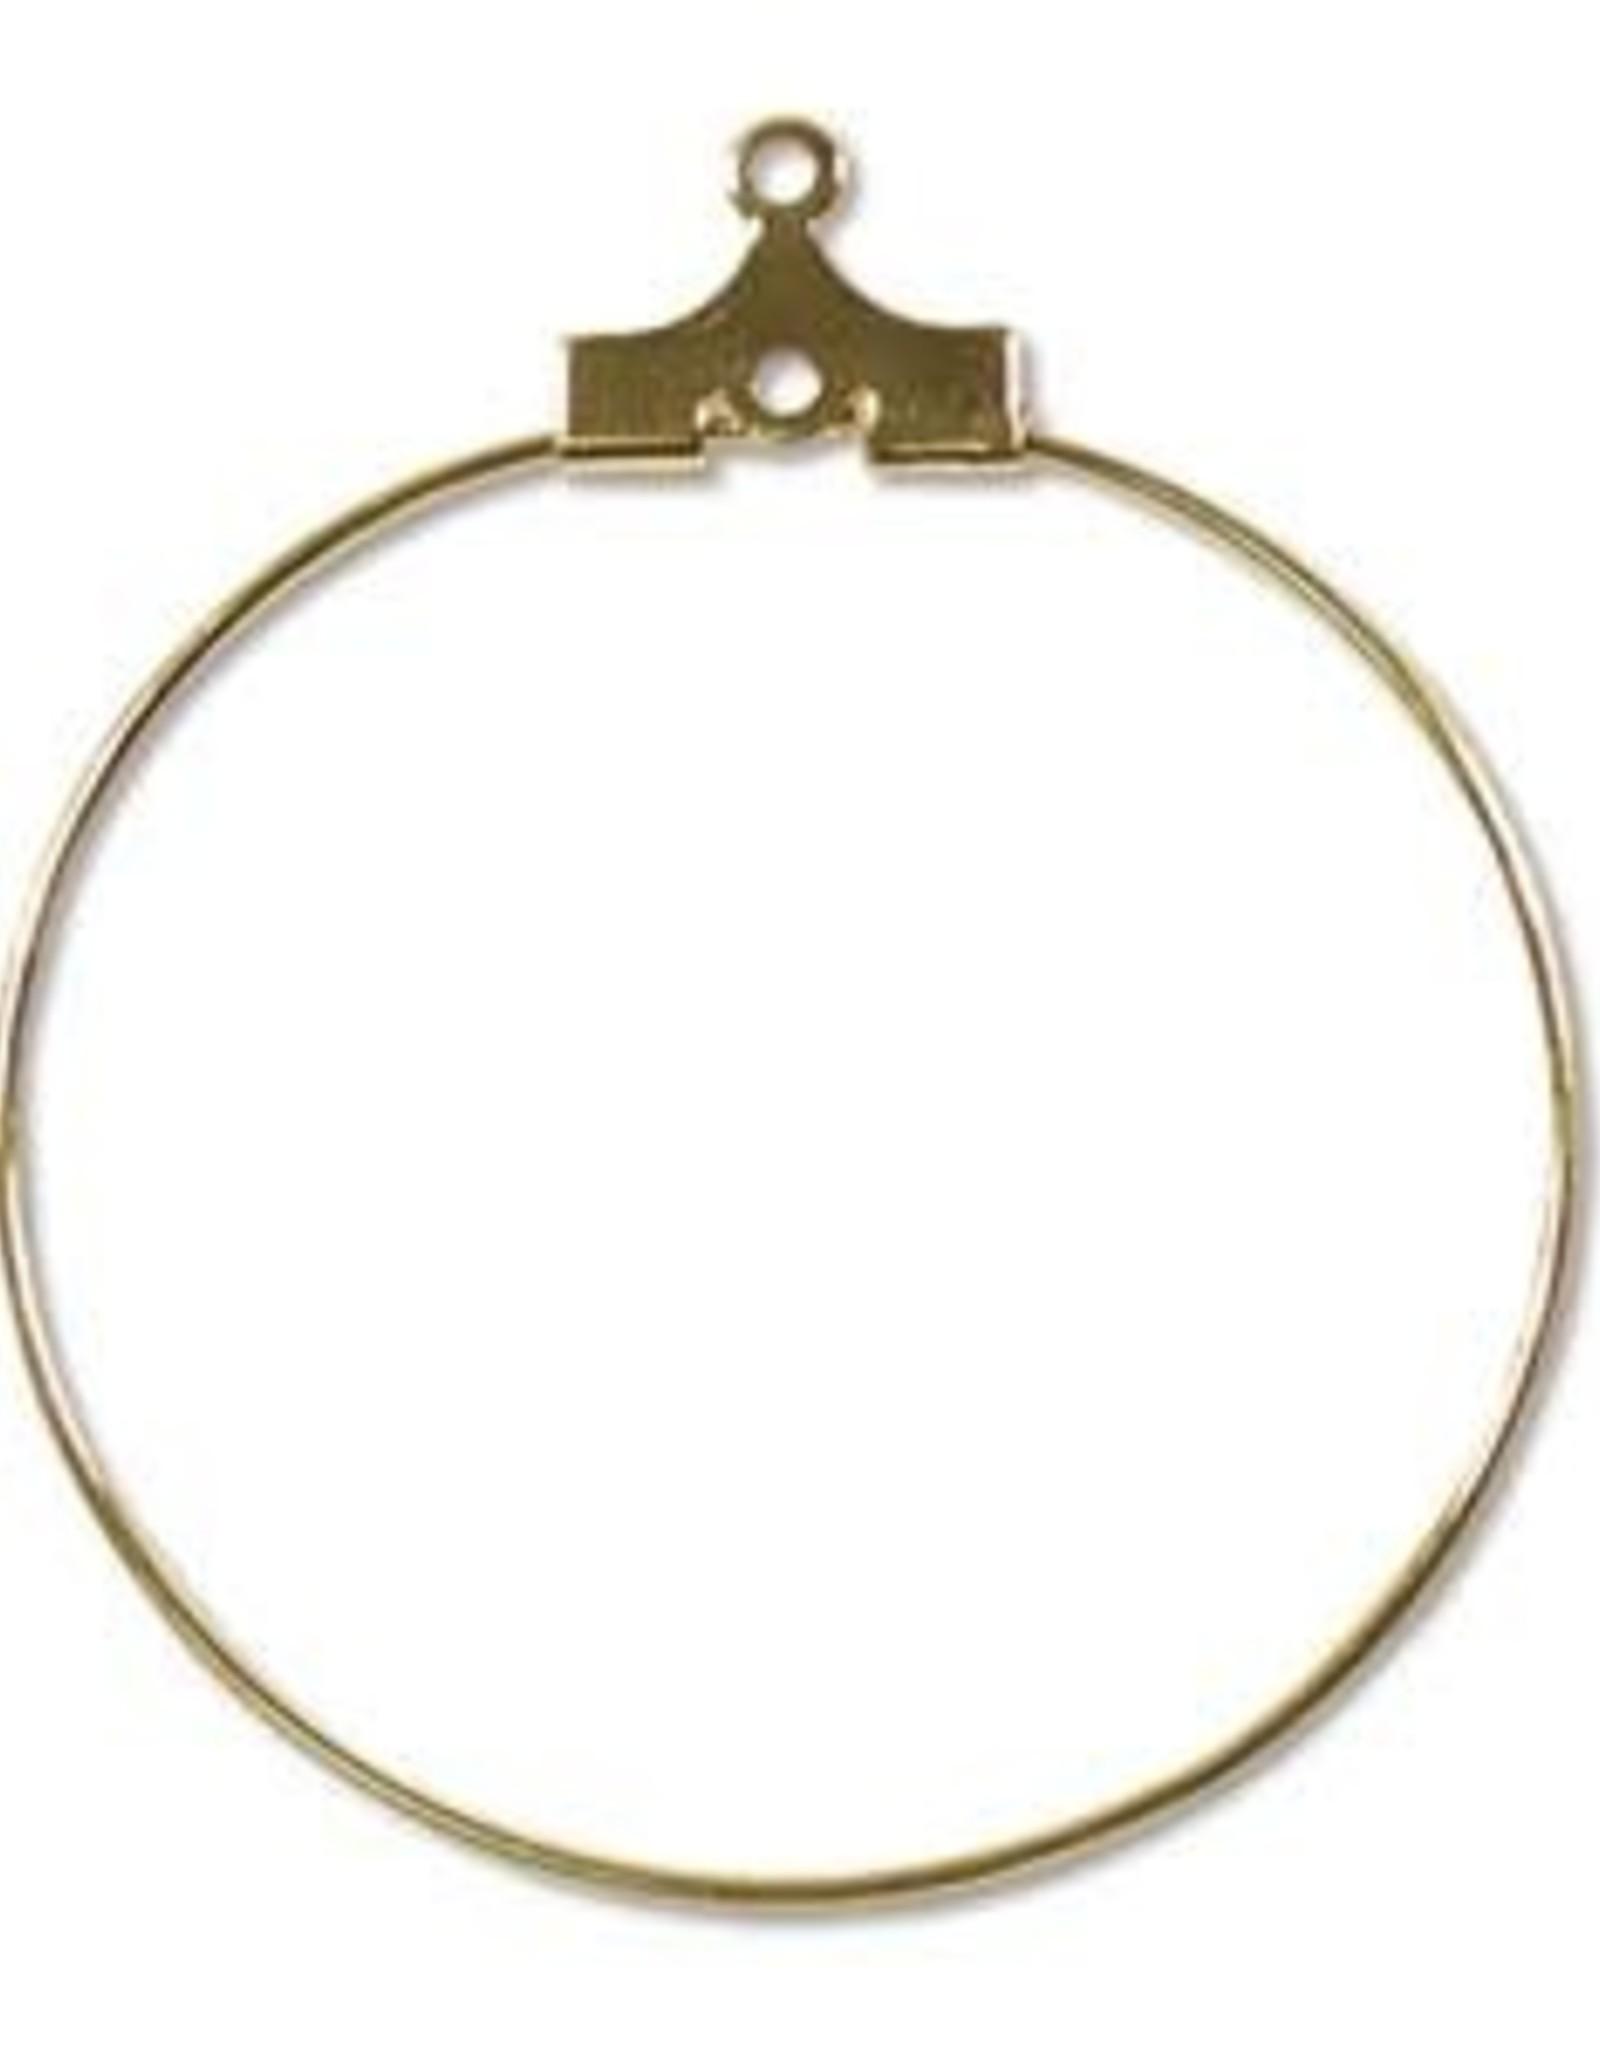 30mm Bead. Hoop Gold Plate Qty 12